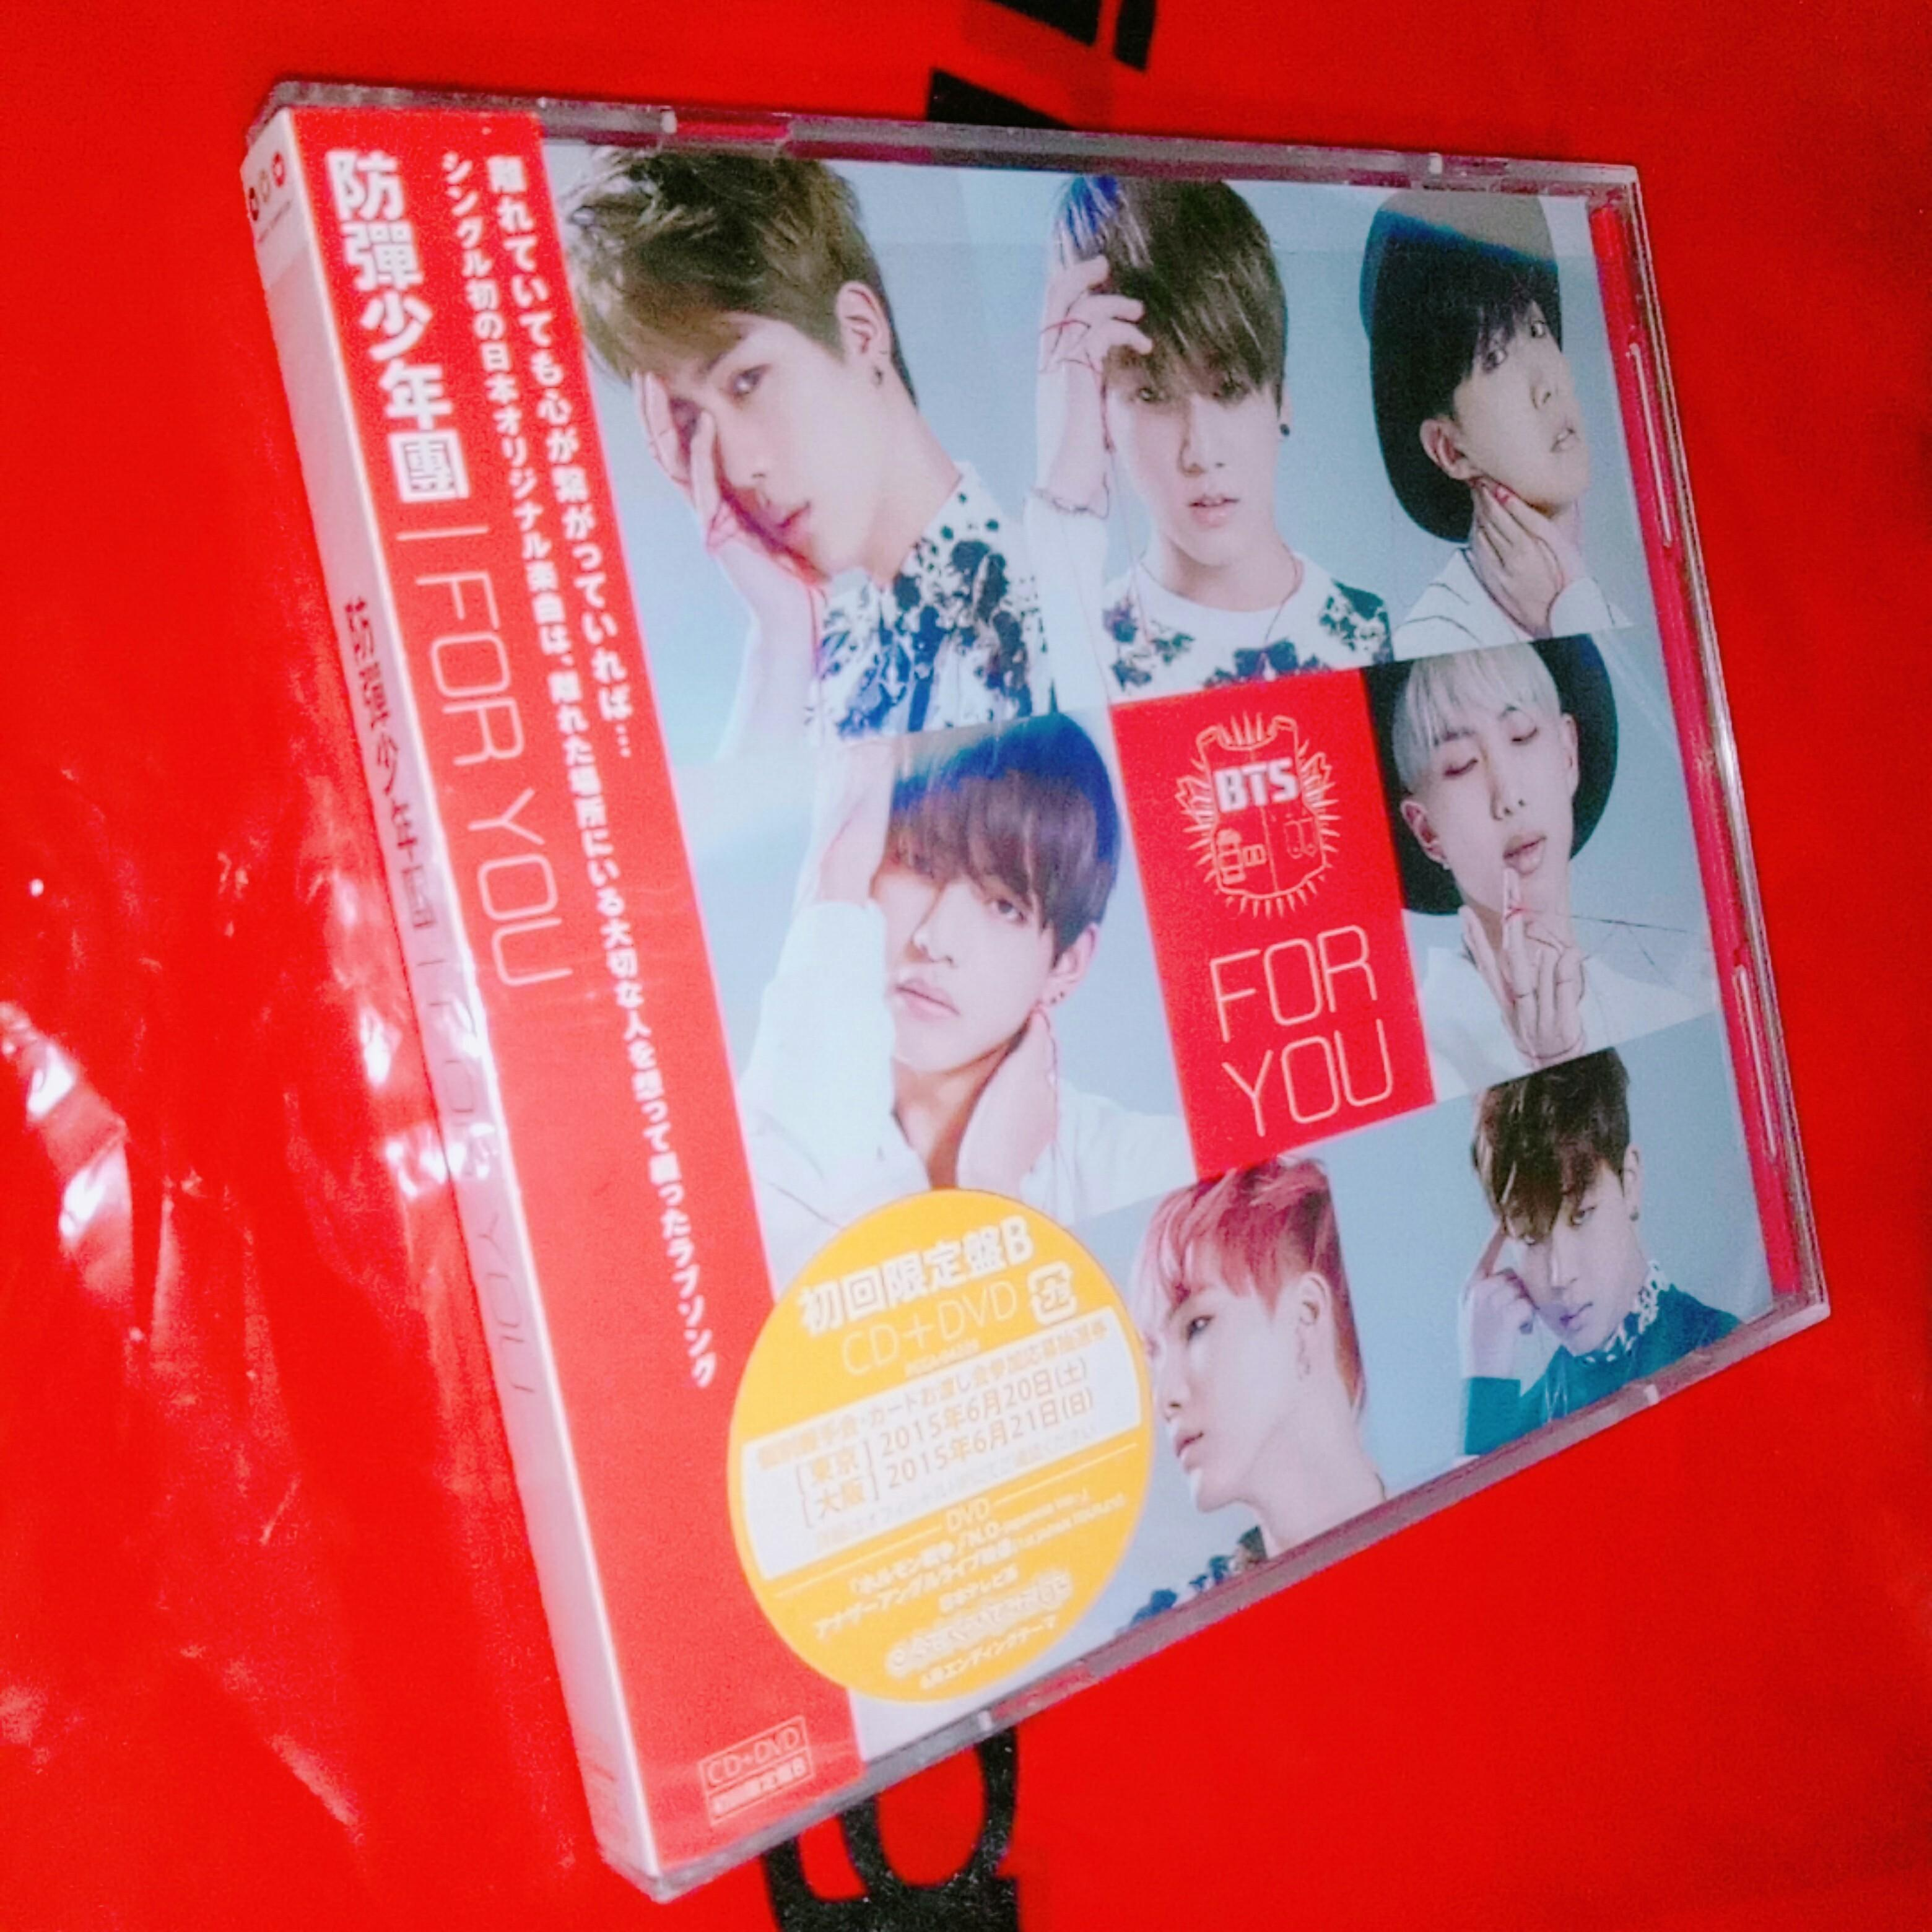 BTS 방탄소년단 - For You [First Press Limited Edition B](CD+DVD) ( Jpn ver )